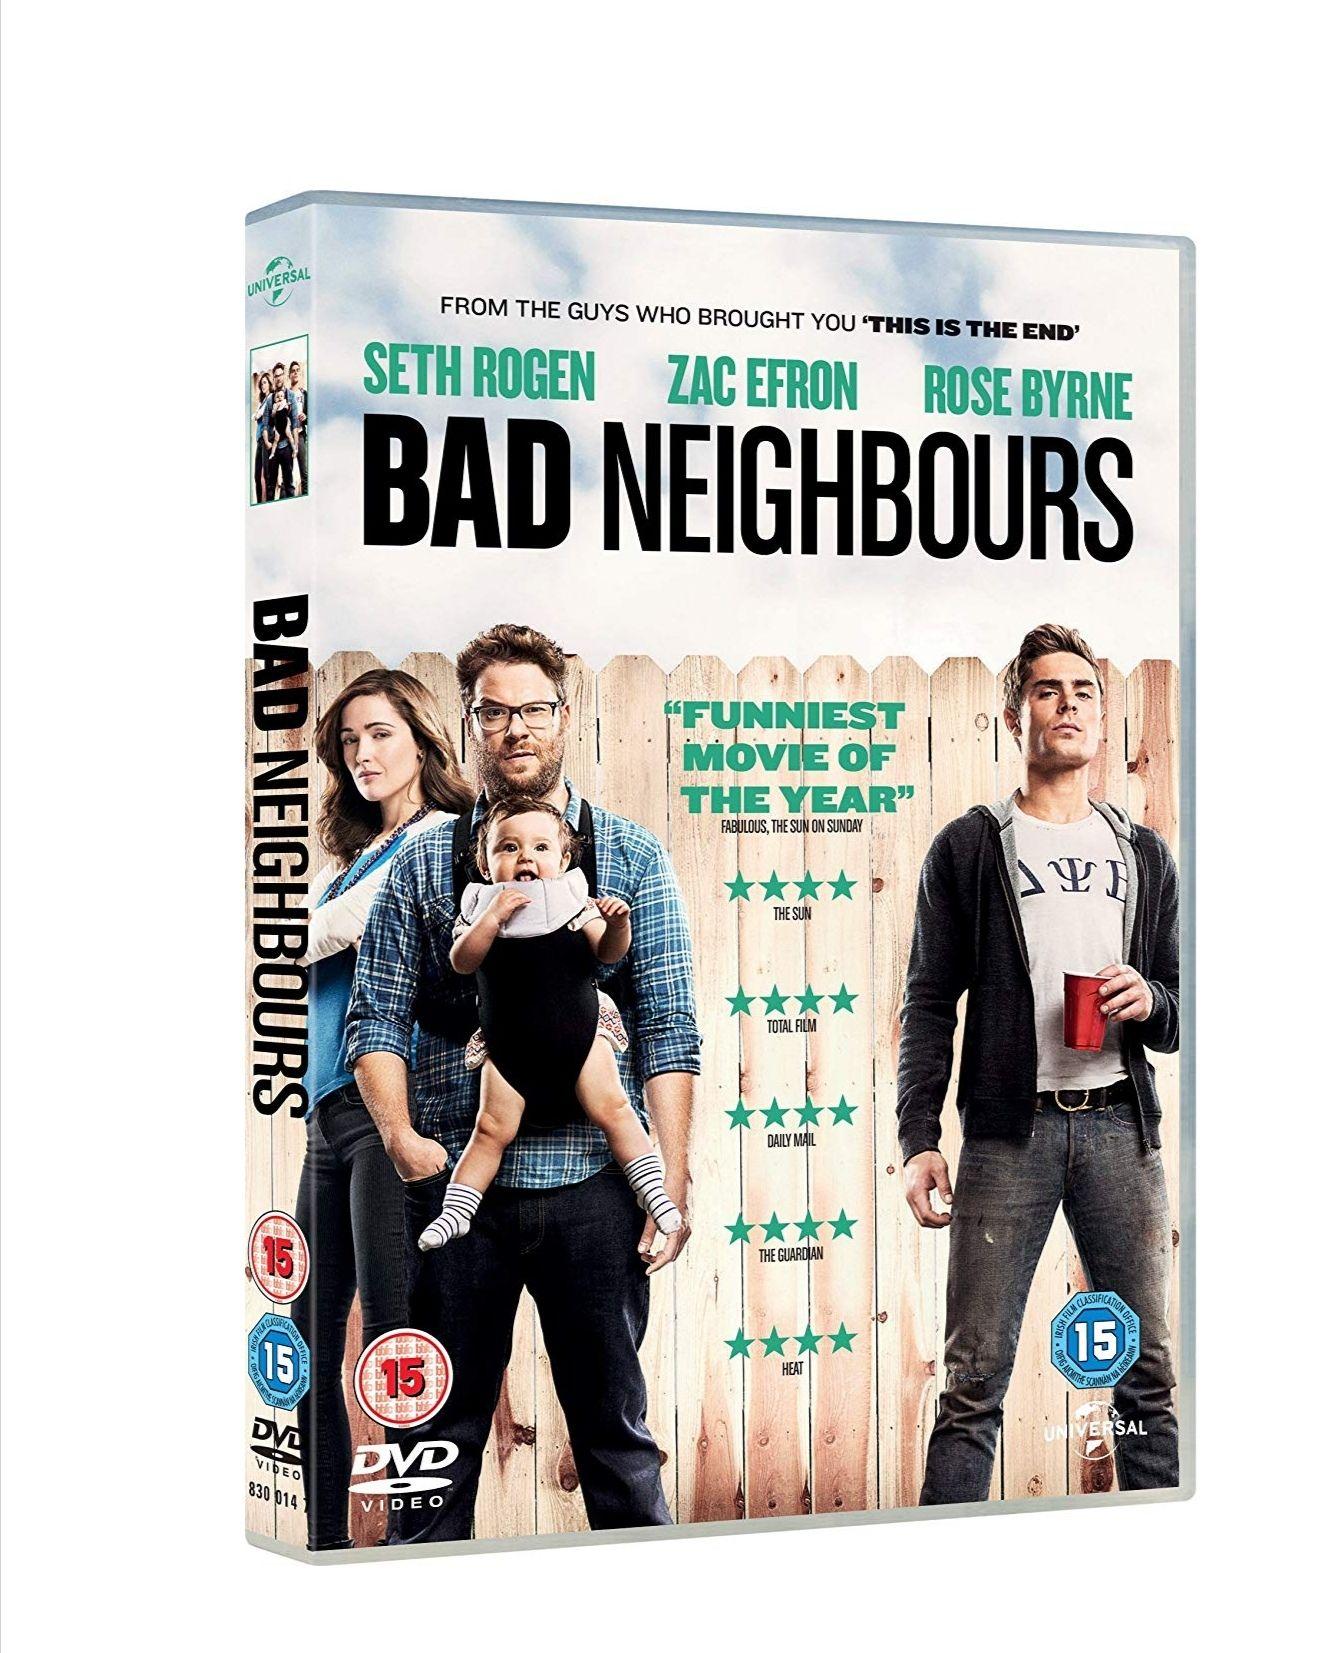 Bad Neighbours [DVD] [2014] £1.06 (Prime) / £4.05 (non Prime) at Amazon